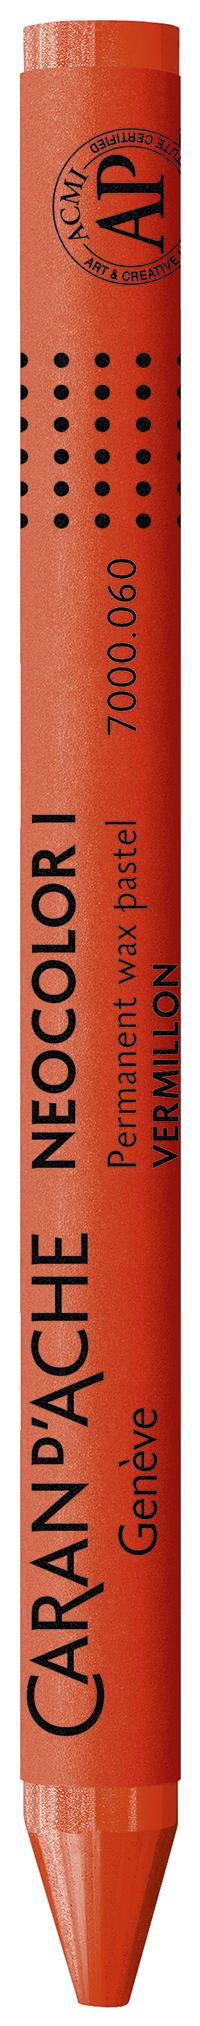 Neocolor I Pastel Carandache